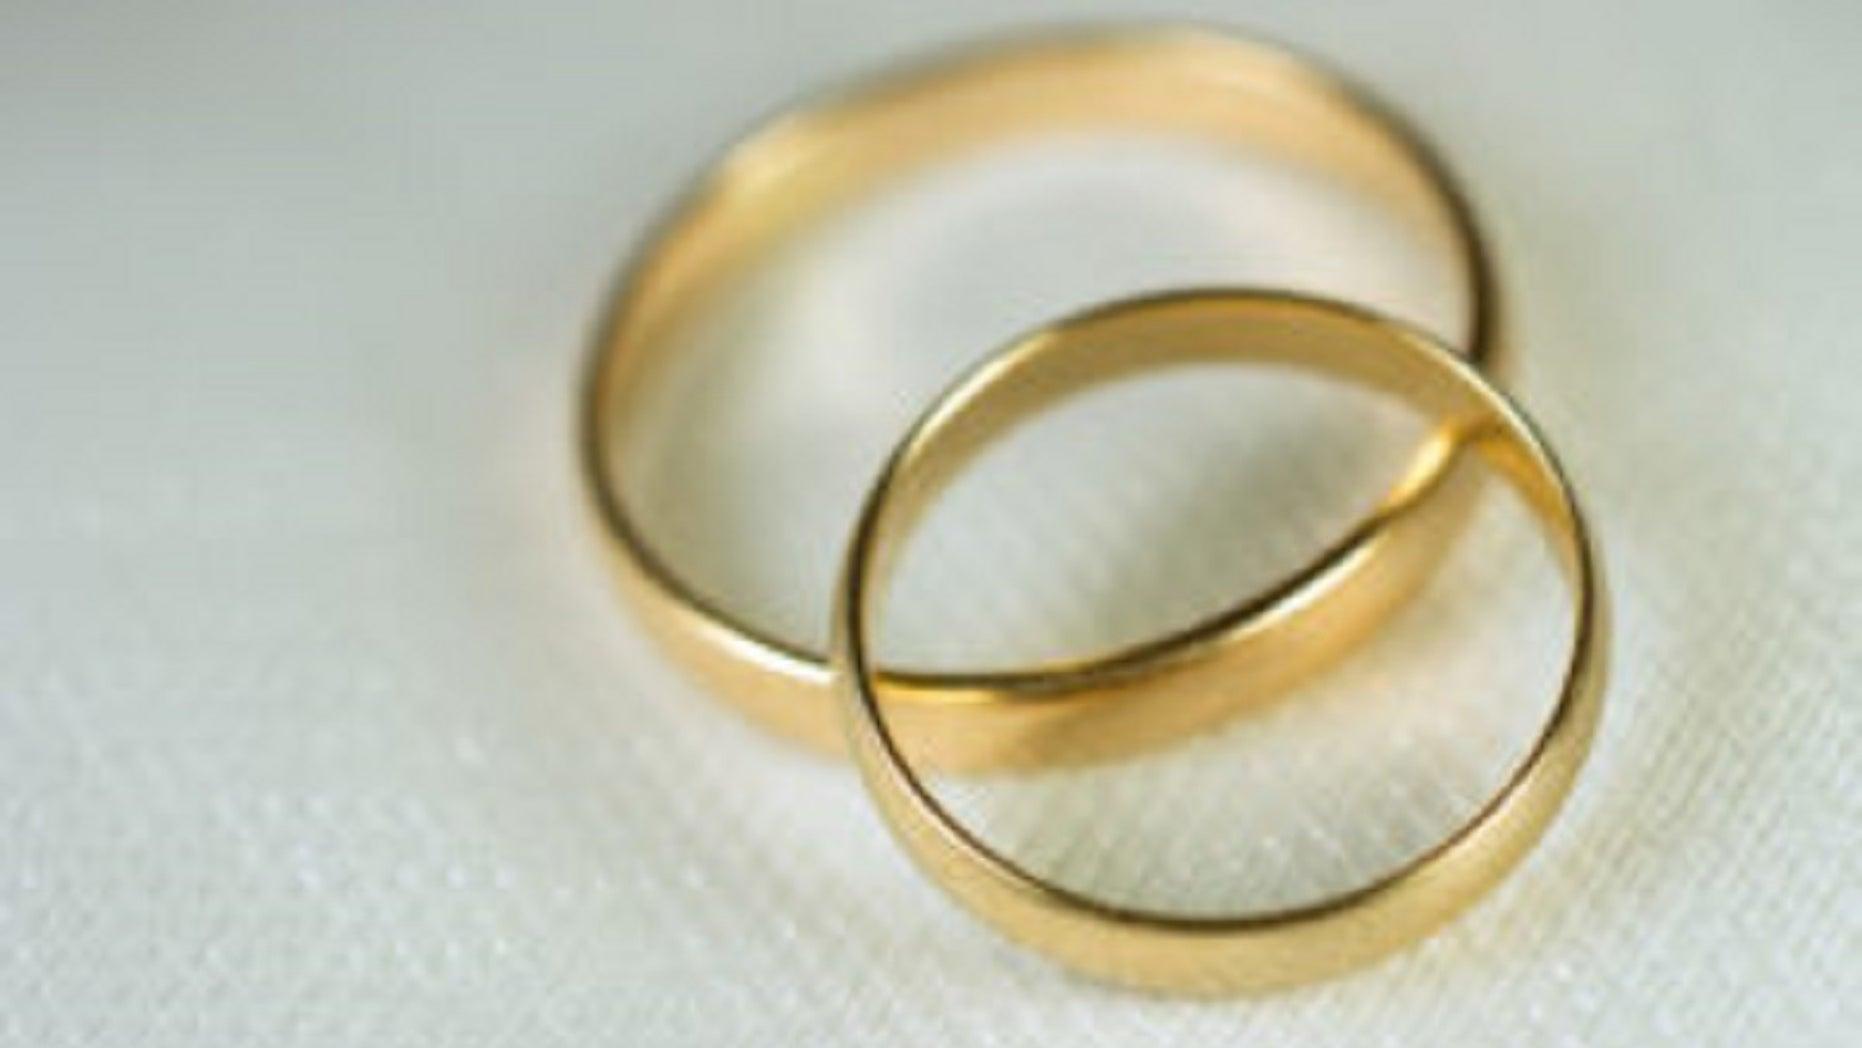 A Massachusettsman avoided jail time in a sham marriage scheme.